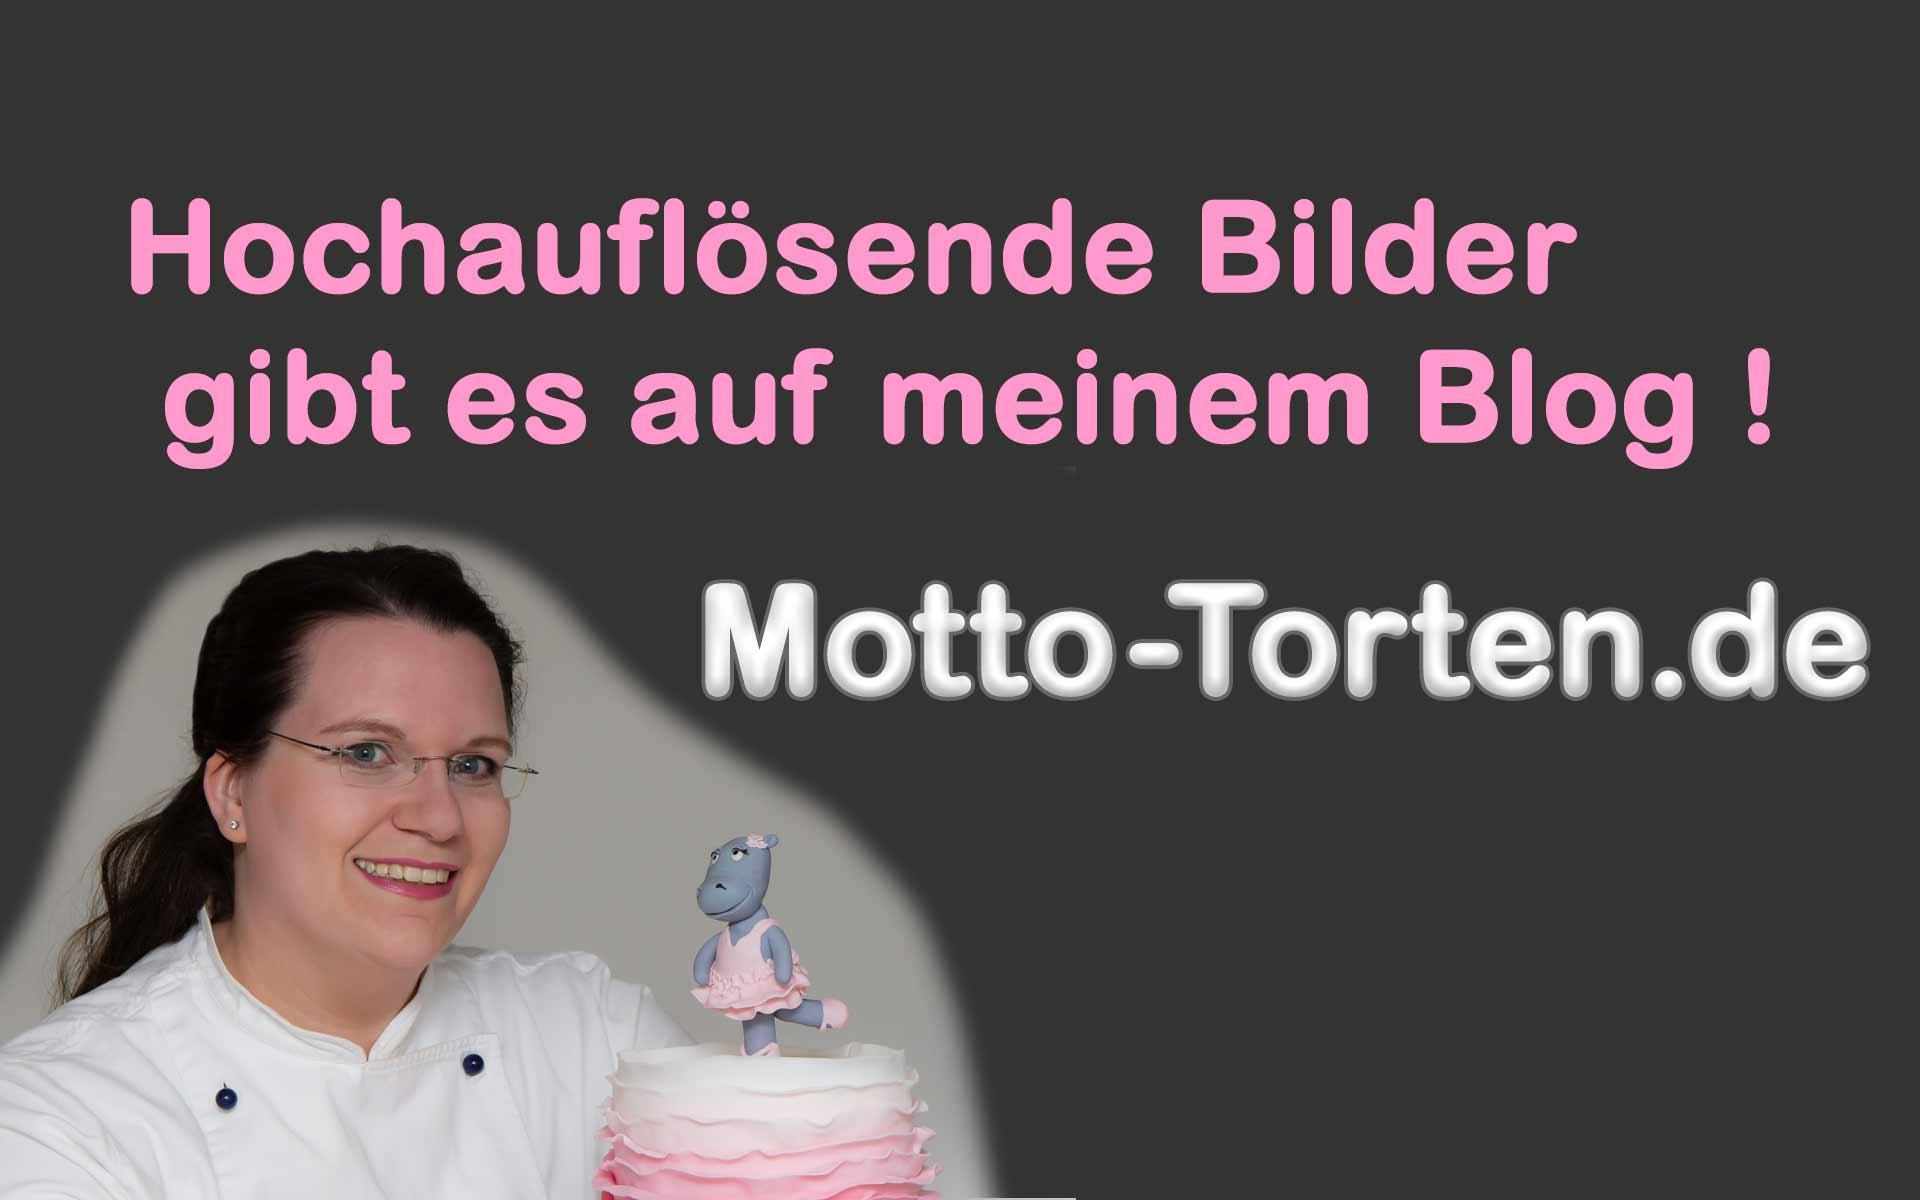 Torte Fussball WM Pokal  MottoTortende